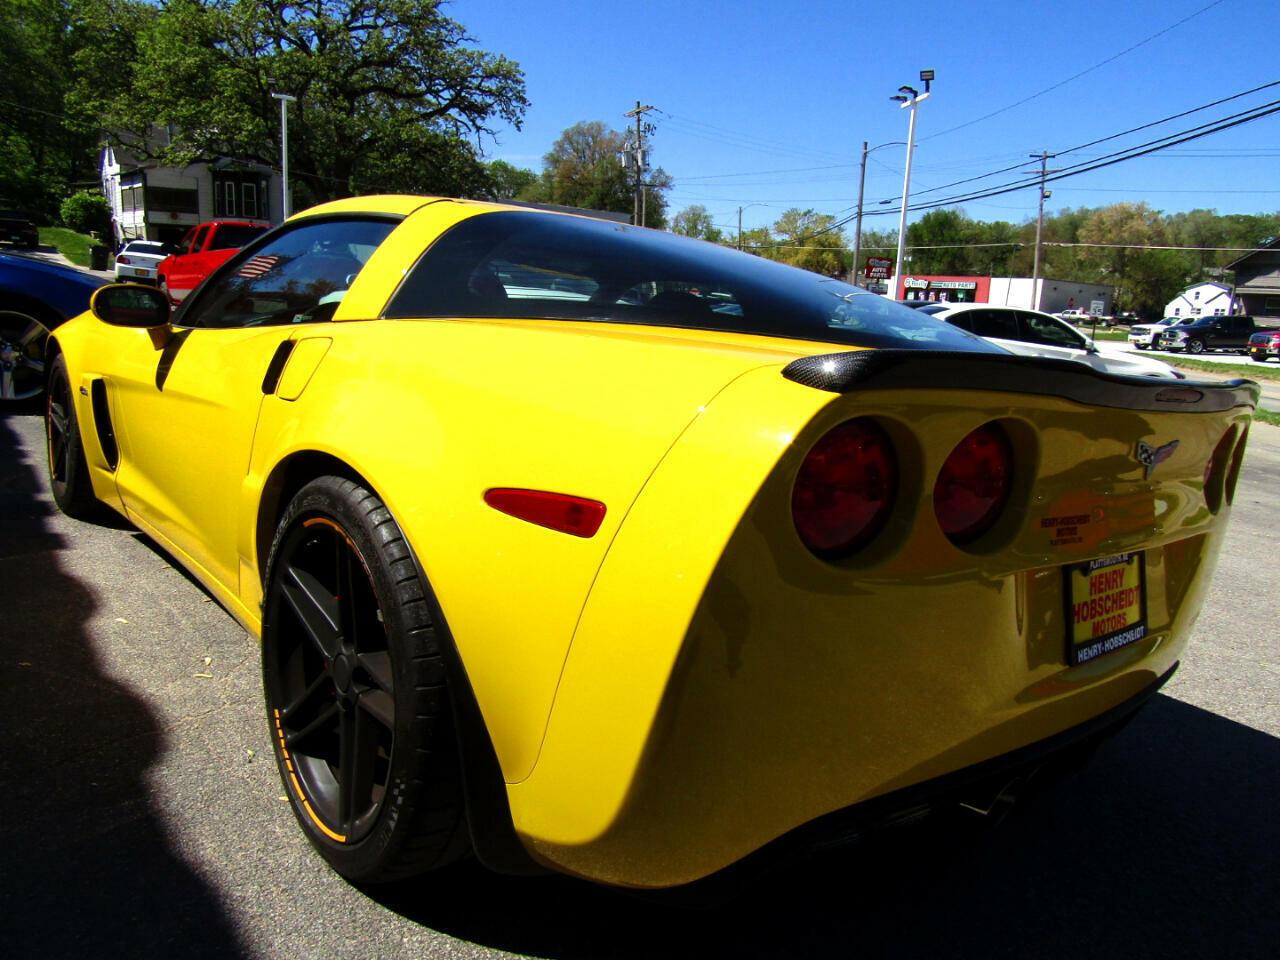 2006 Yellow Chevrolet Corvette Z06  | C6 Corvette Photo 7